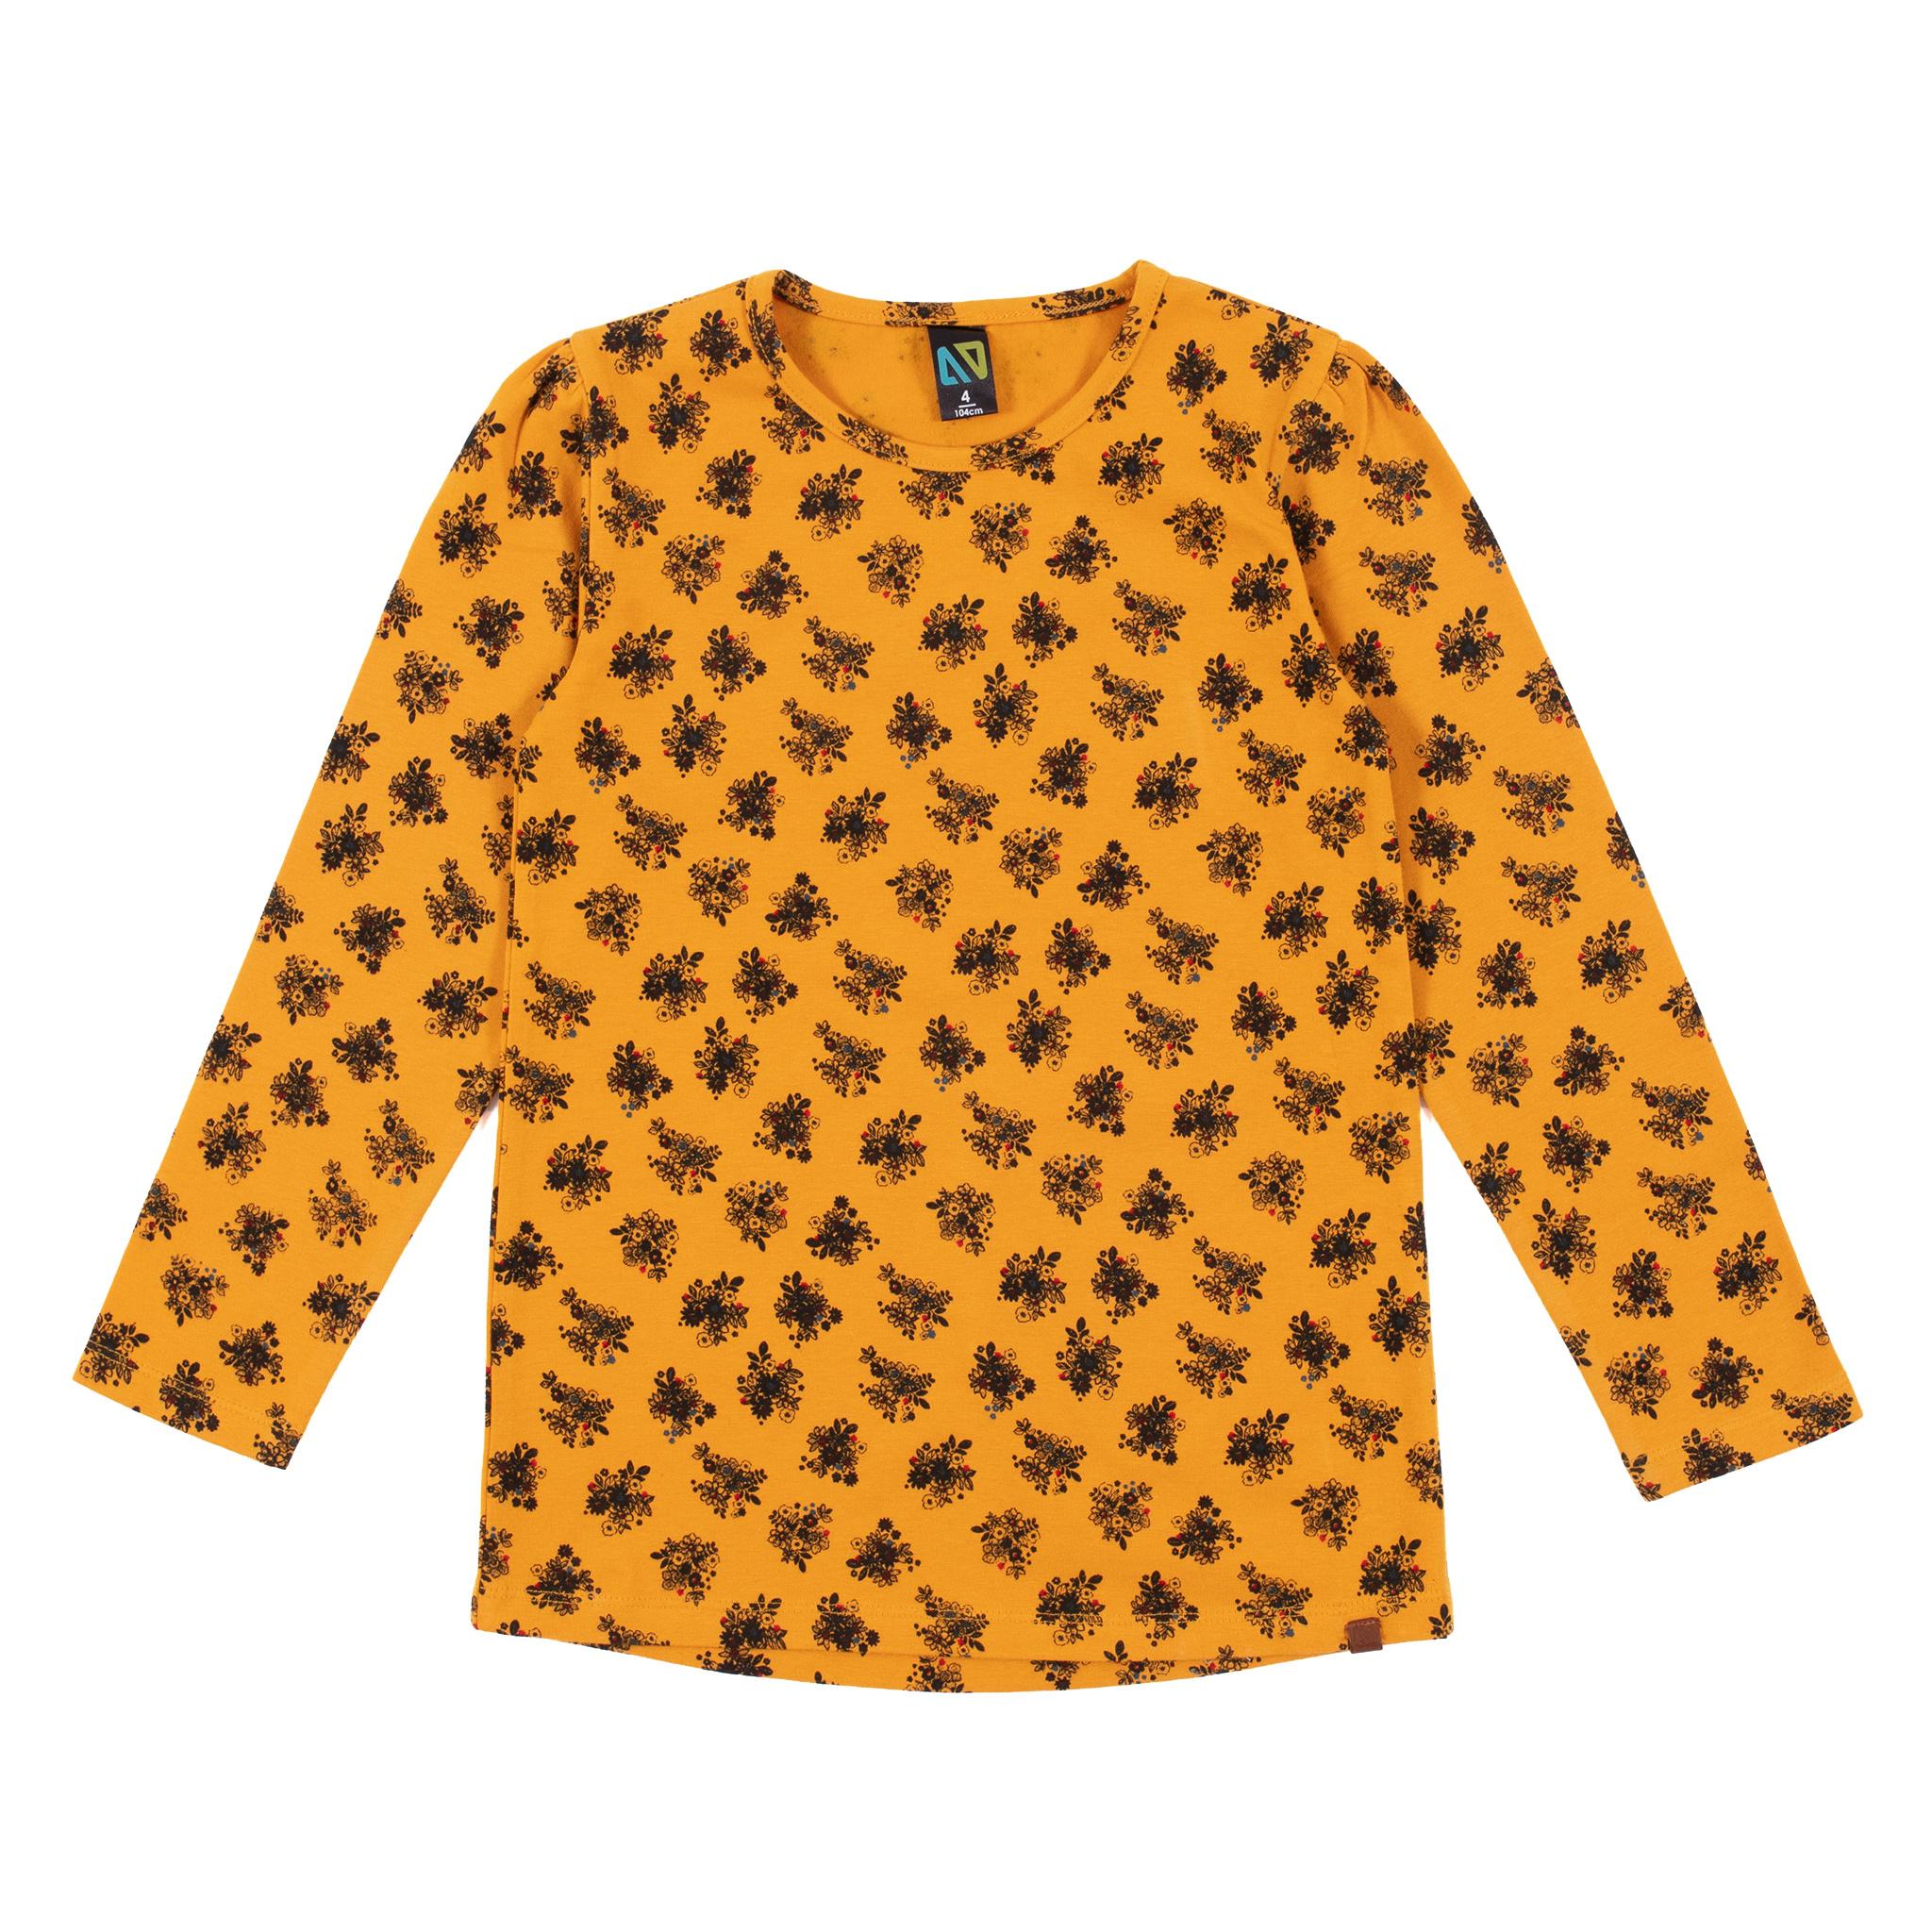 Chandail collection En mode Rodéo-1